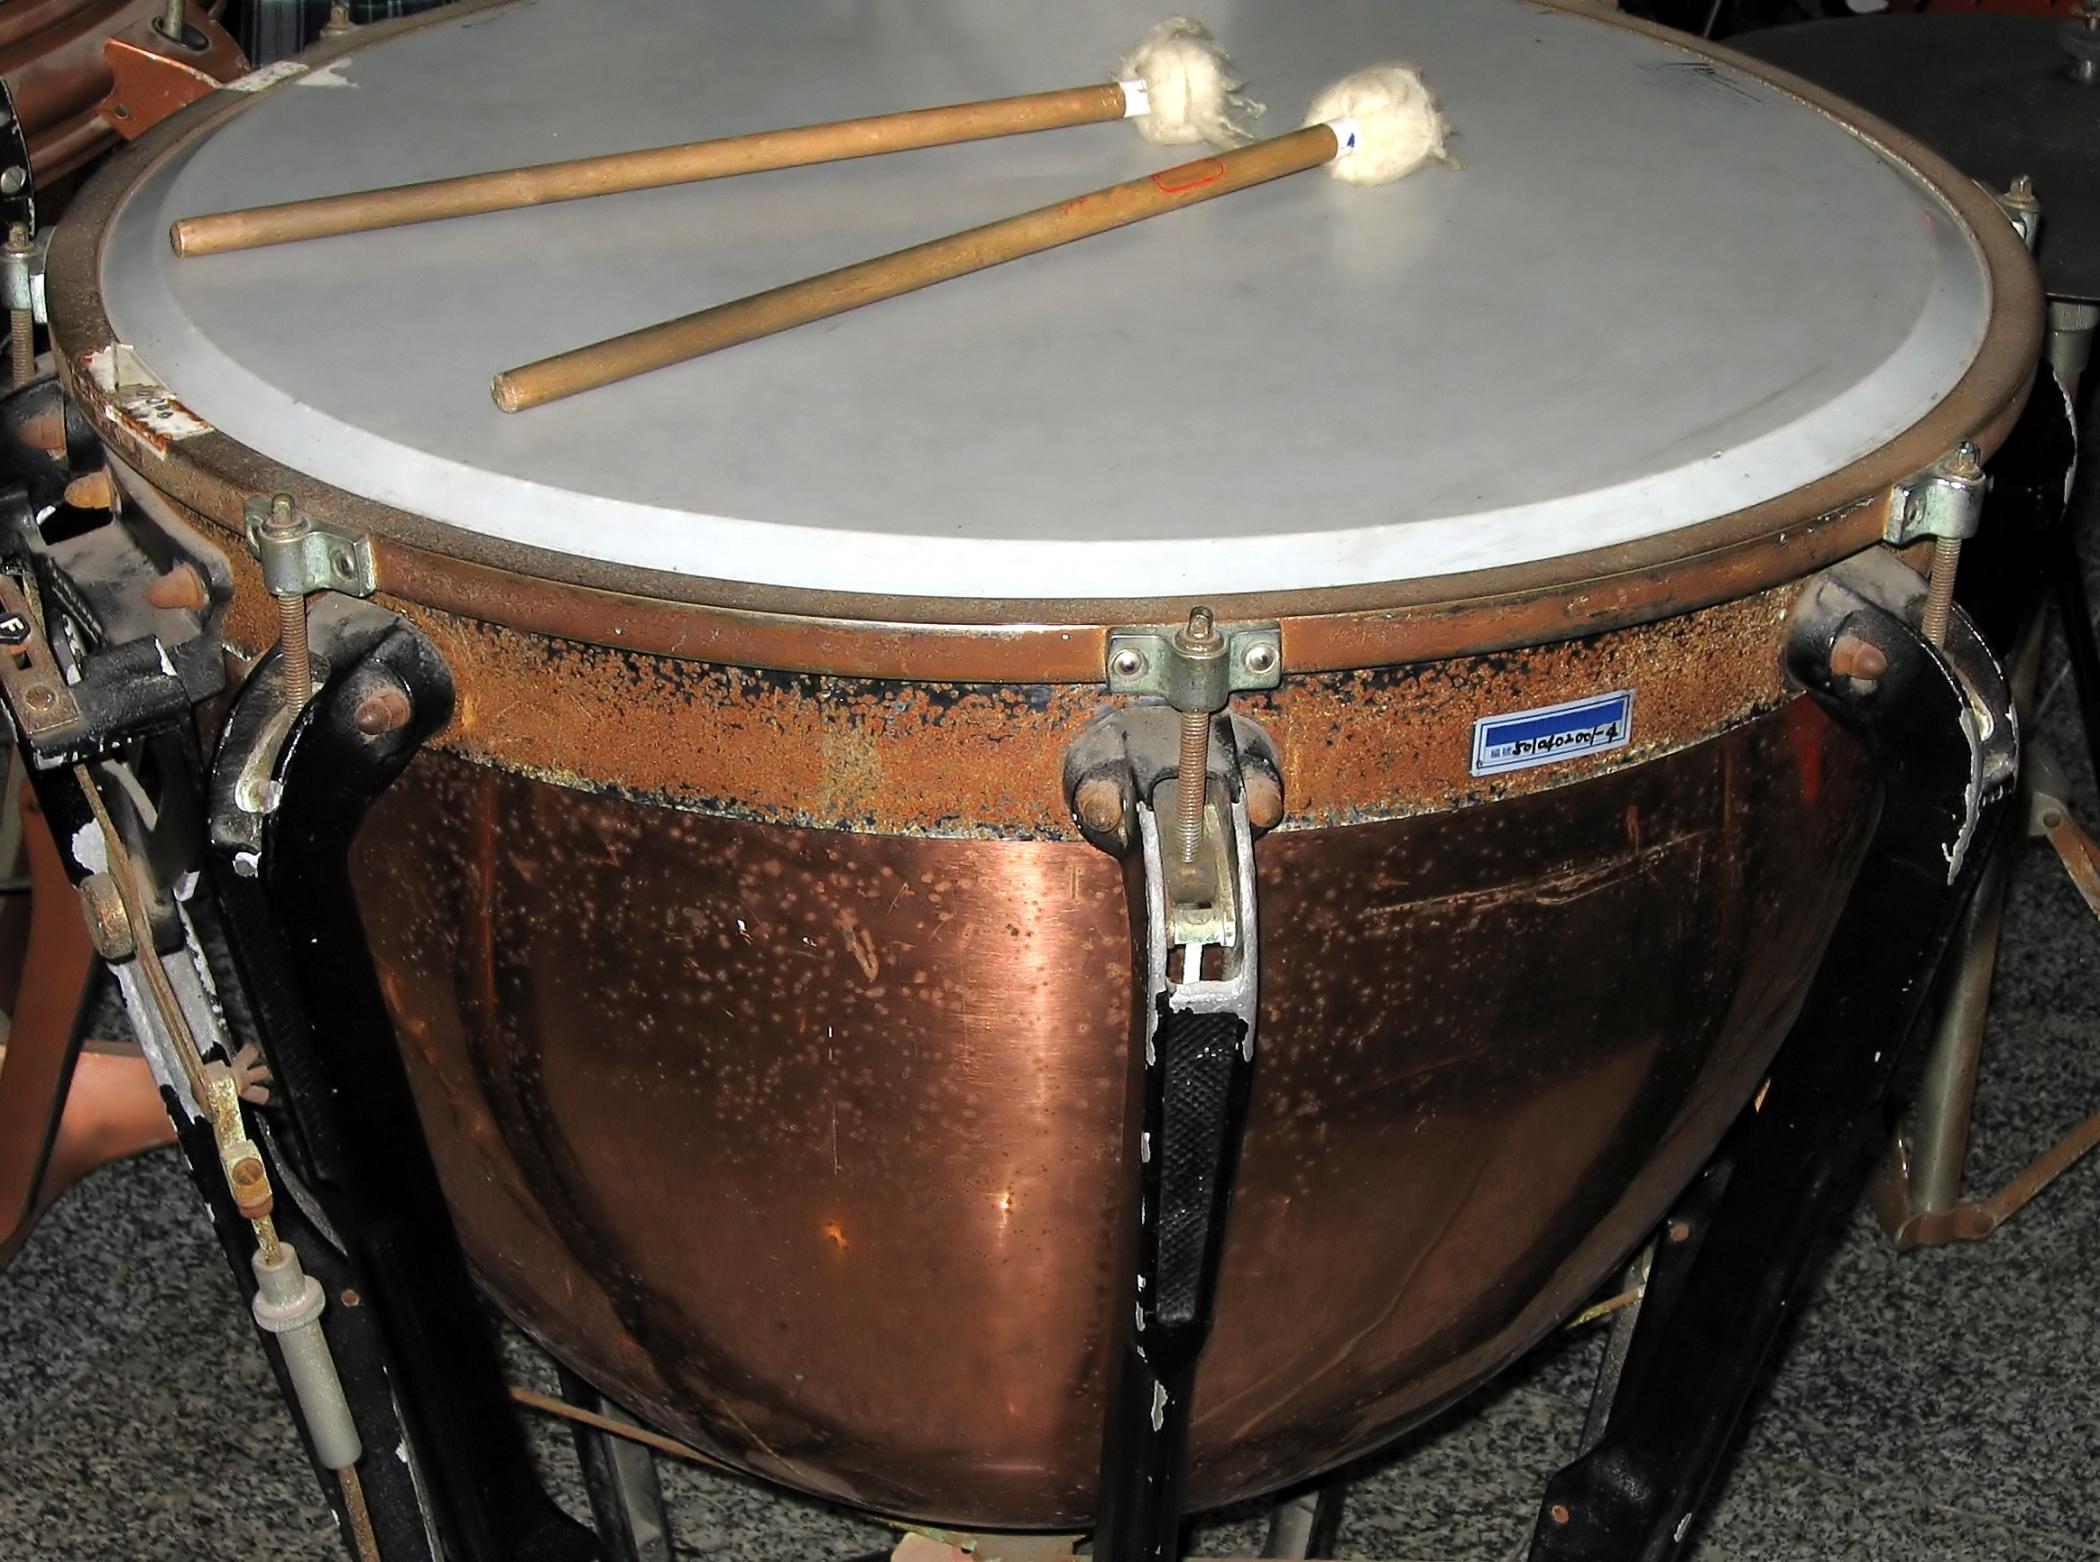 Large Copper Kettledrum, Orchestra, Stick, Skin, Shape, HQ Photo